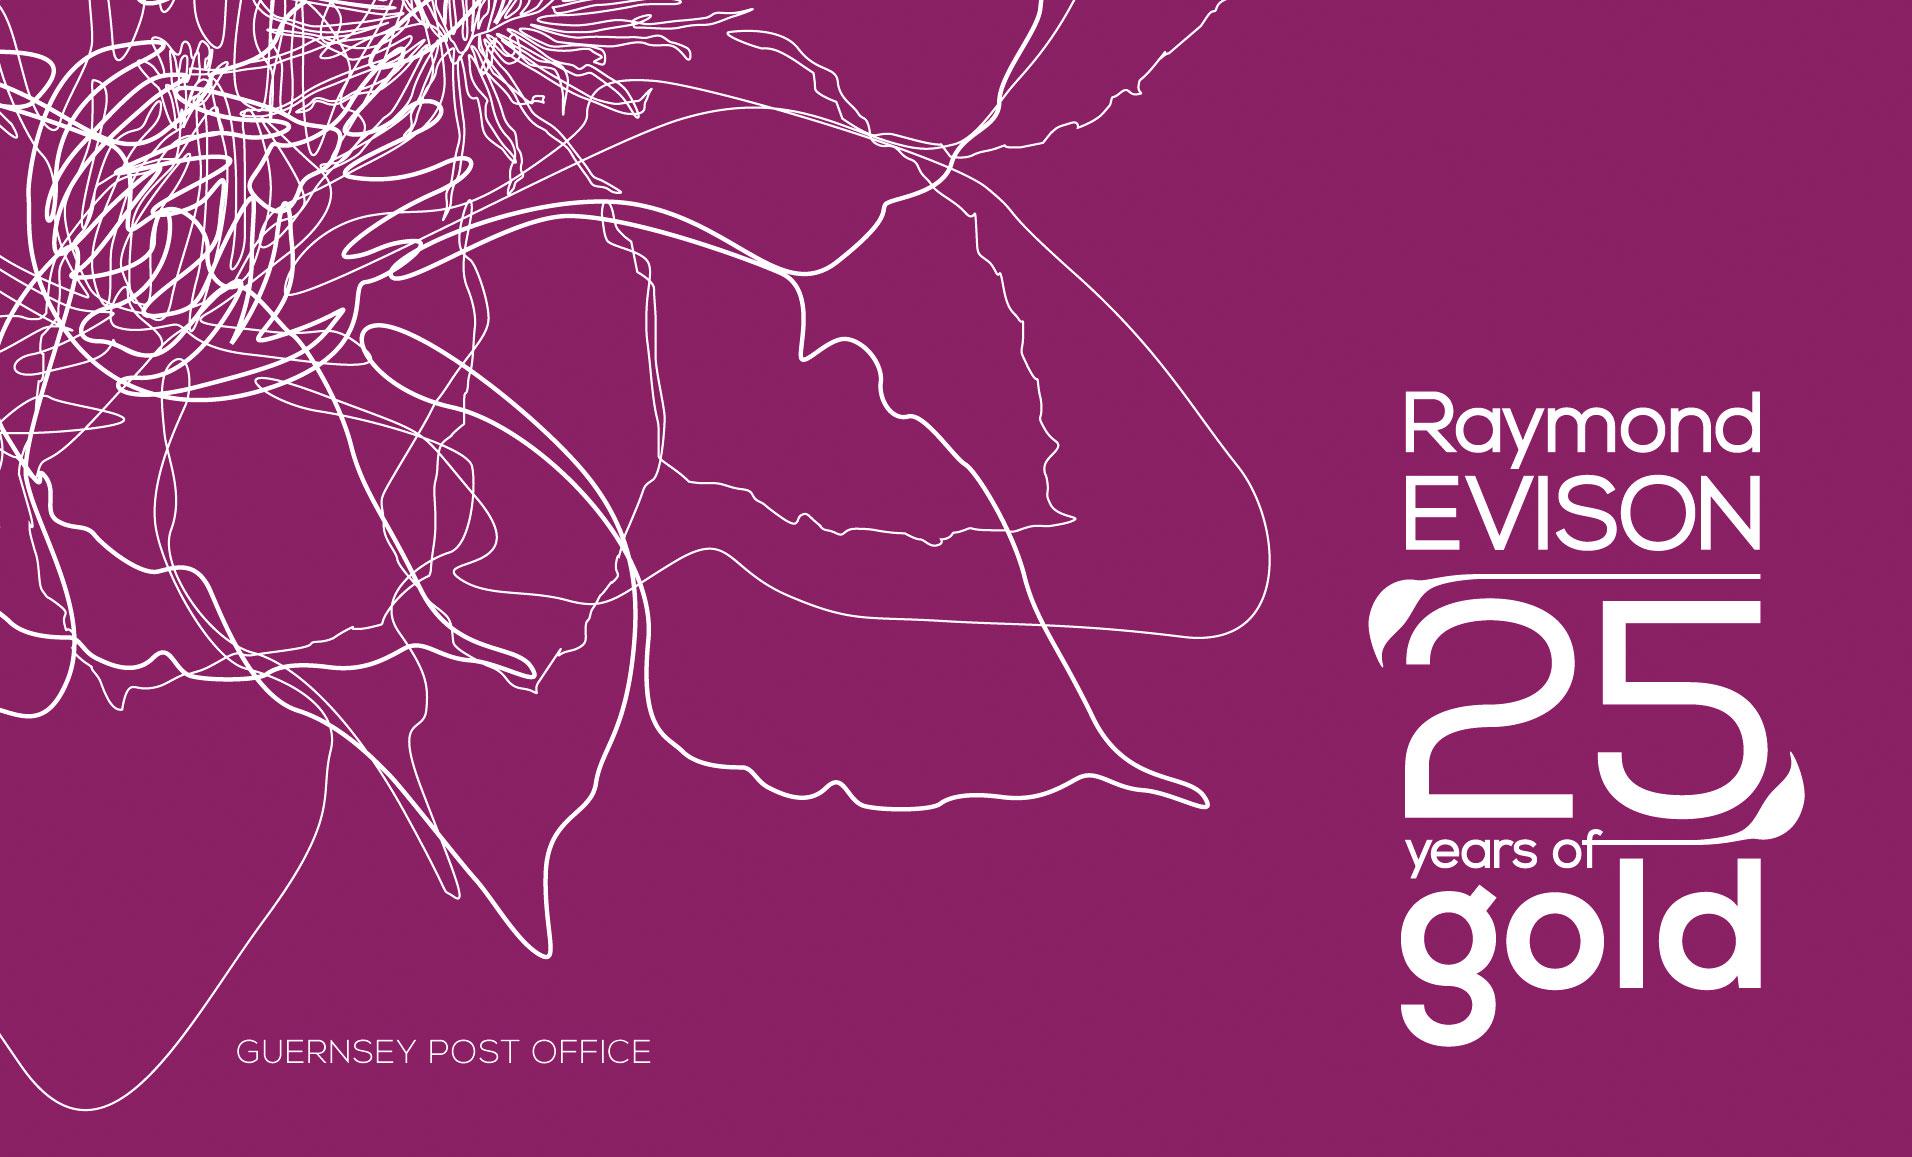 Raymond Evison - 25 years of Gold Prestige Booklet